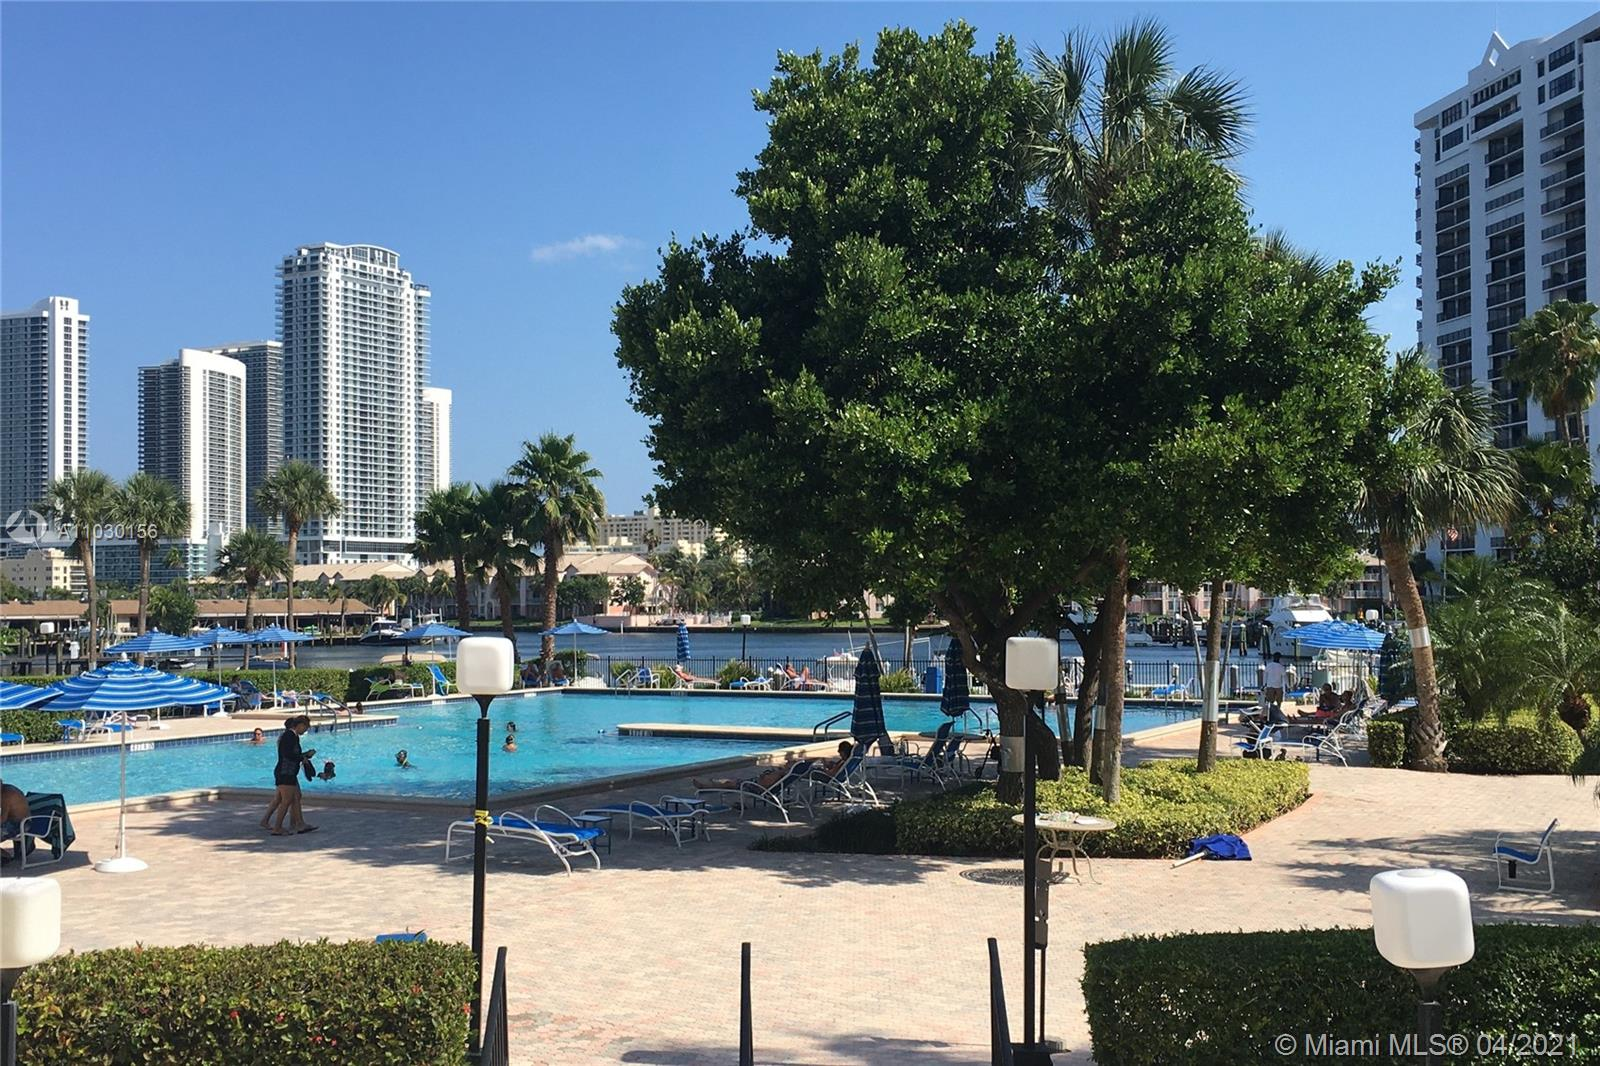 Photo of 2500 Parkview Dr #1108, Hallandale Beach, Florida, 33009 - Pool/Marina